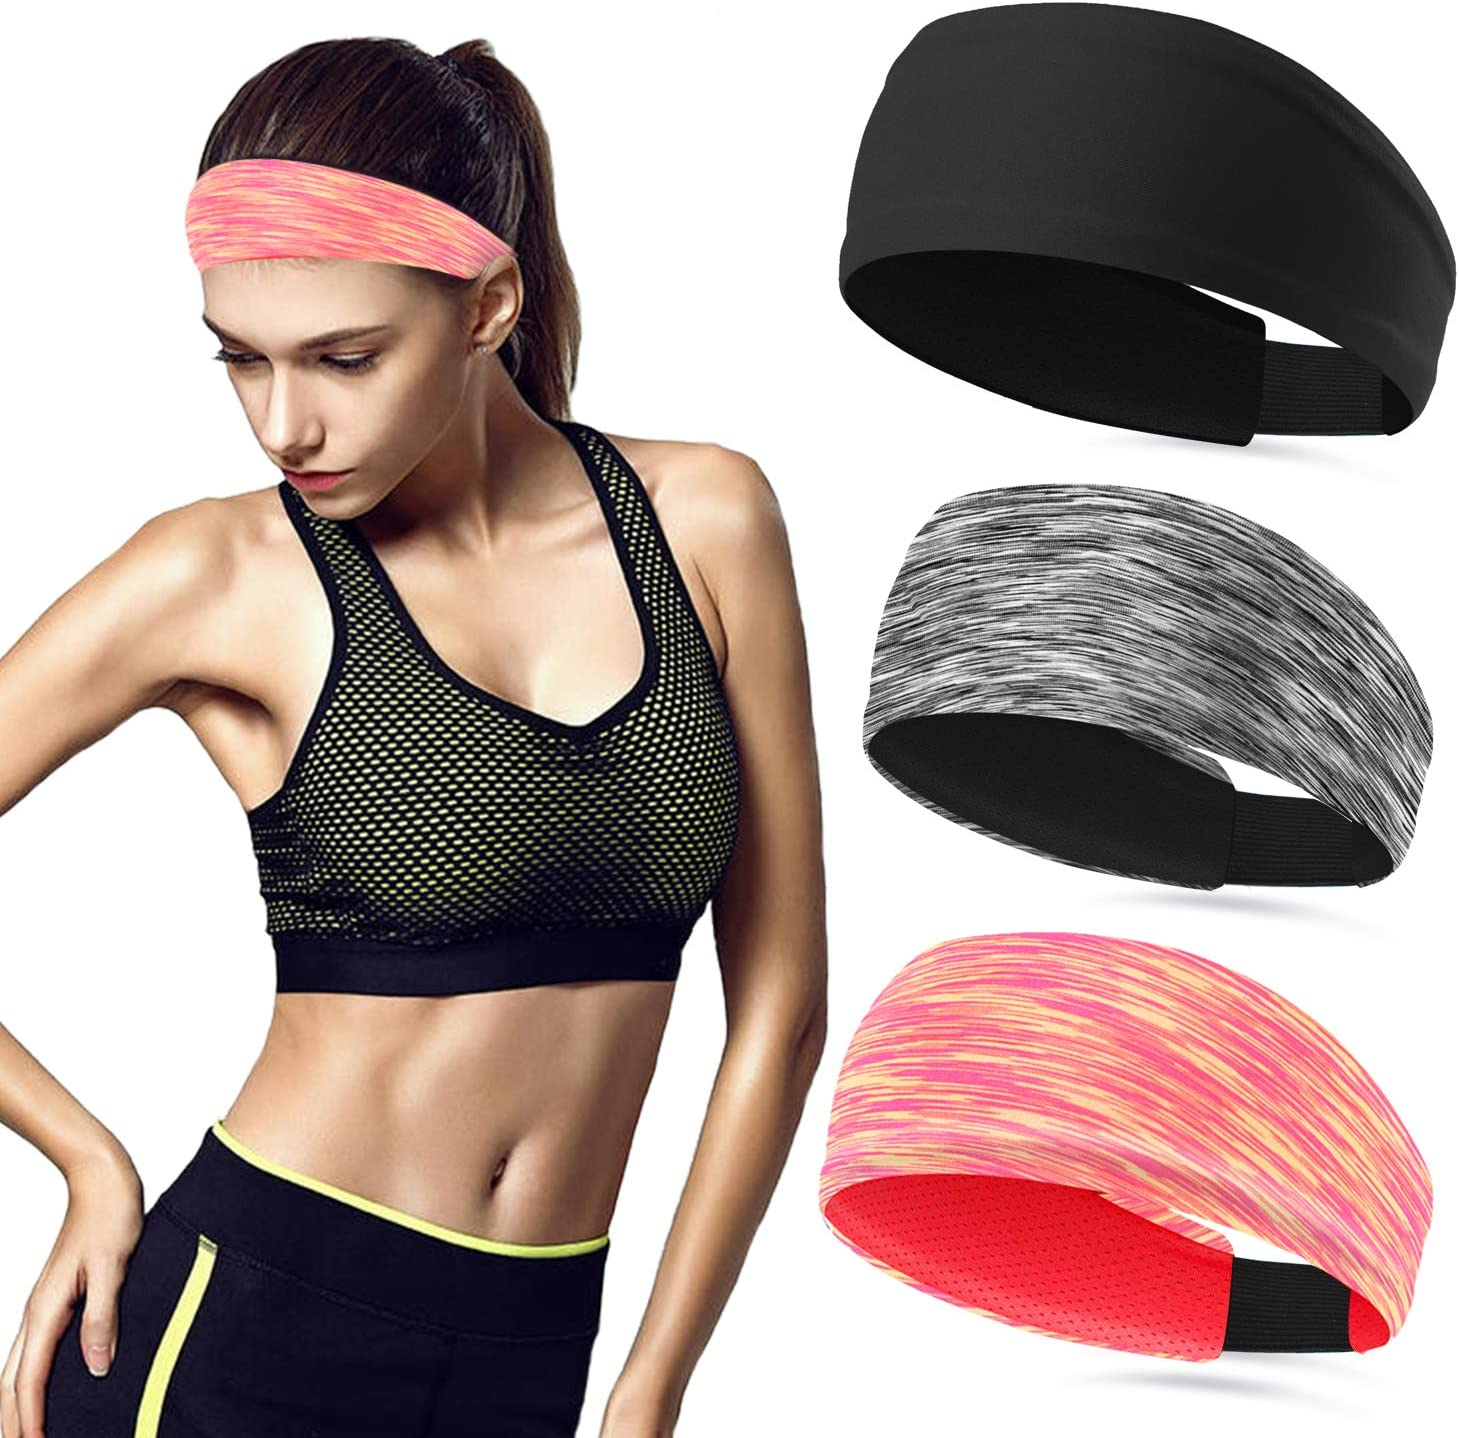 Sweat Bands No Slip Finally popular brand Fashion Workout Save money Women Headbands for Headband